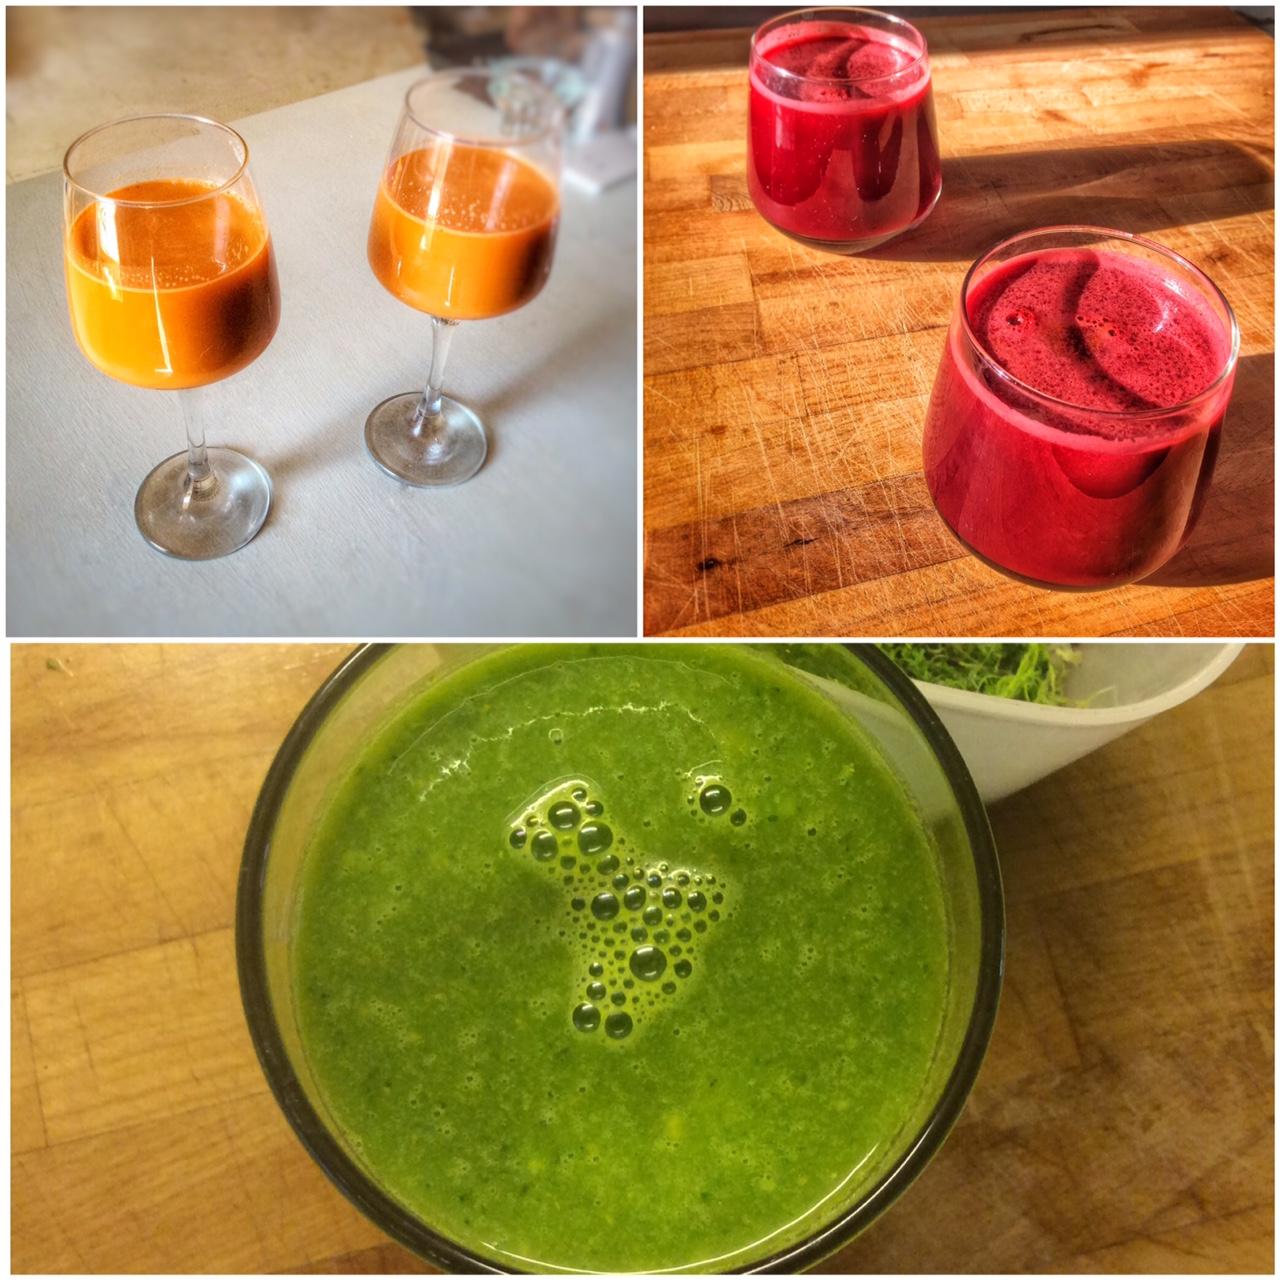 Top 3 Des Jus Detox Recettes De Jus De Fruits Et Legumes Vegan